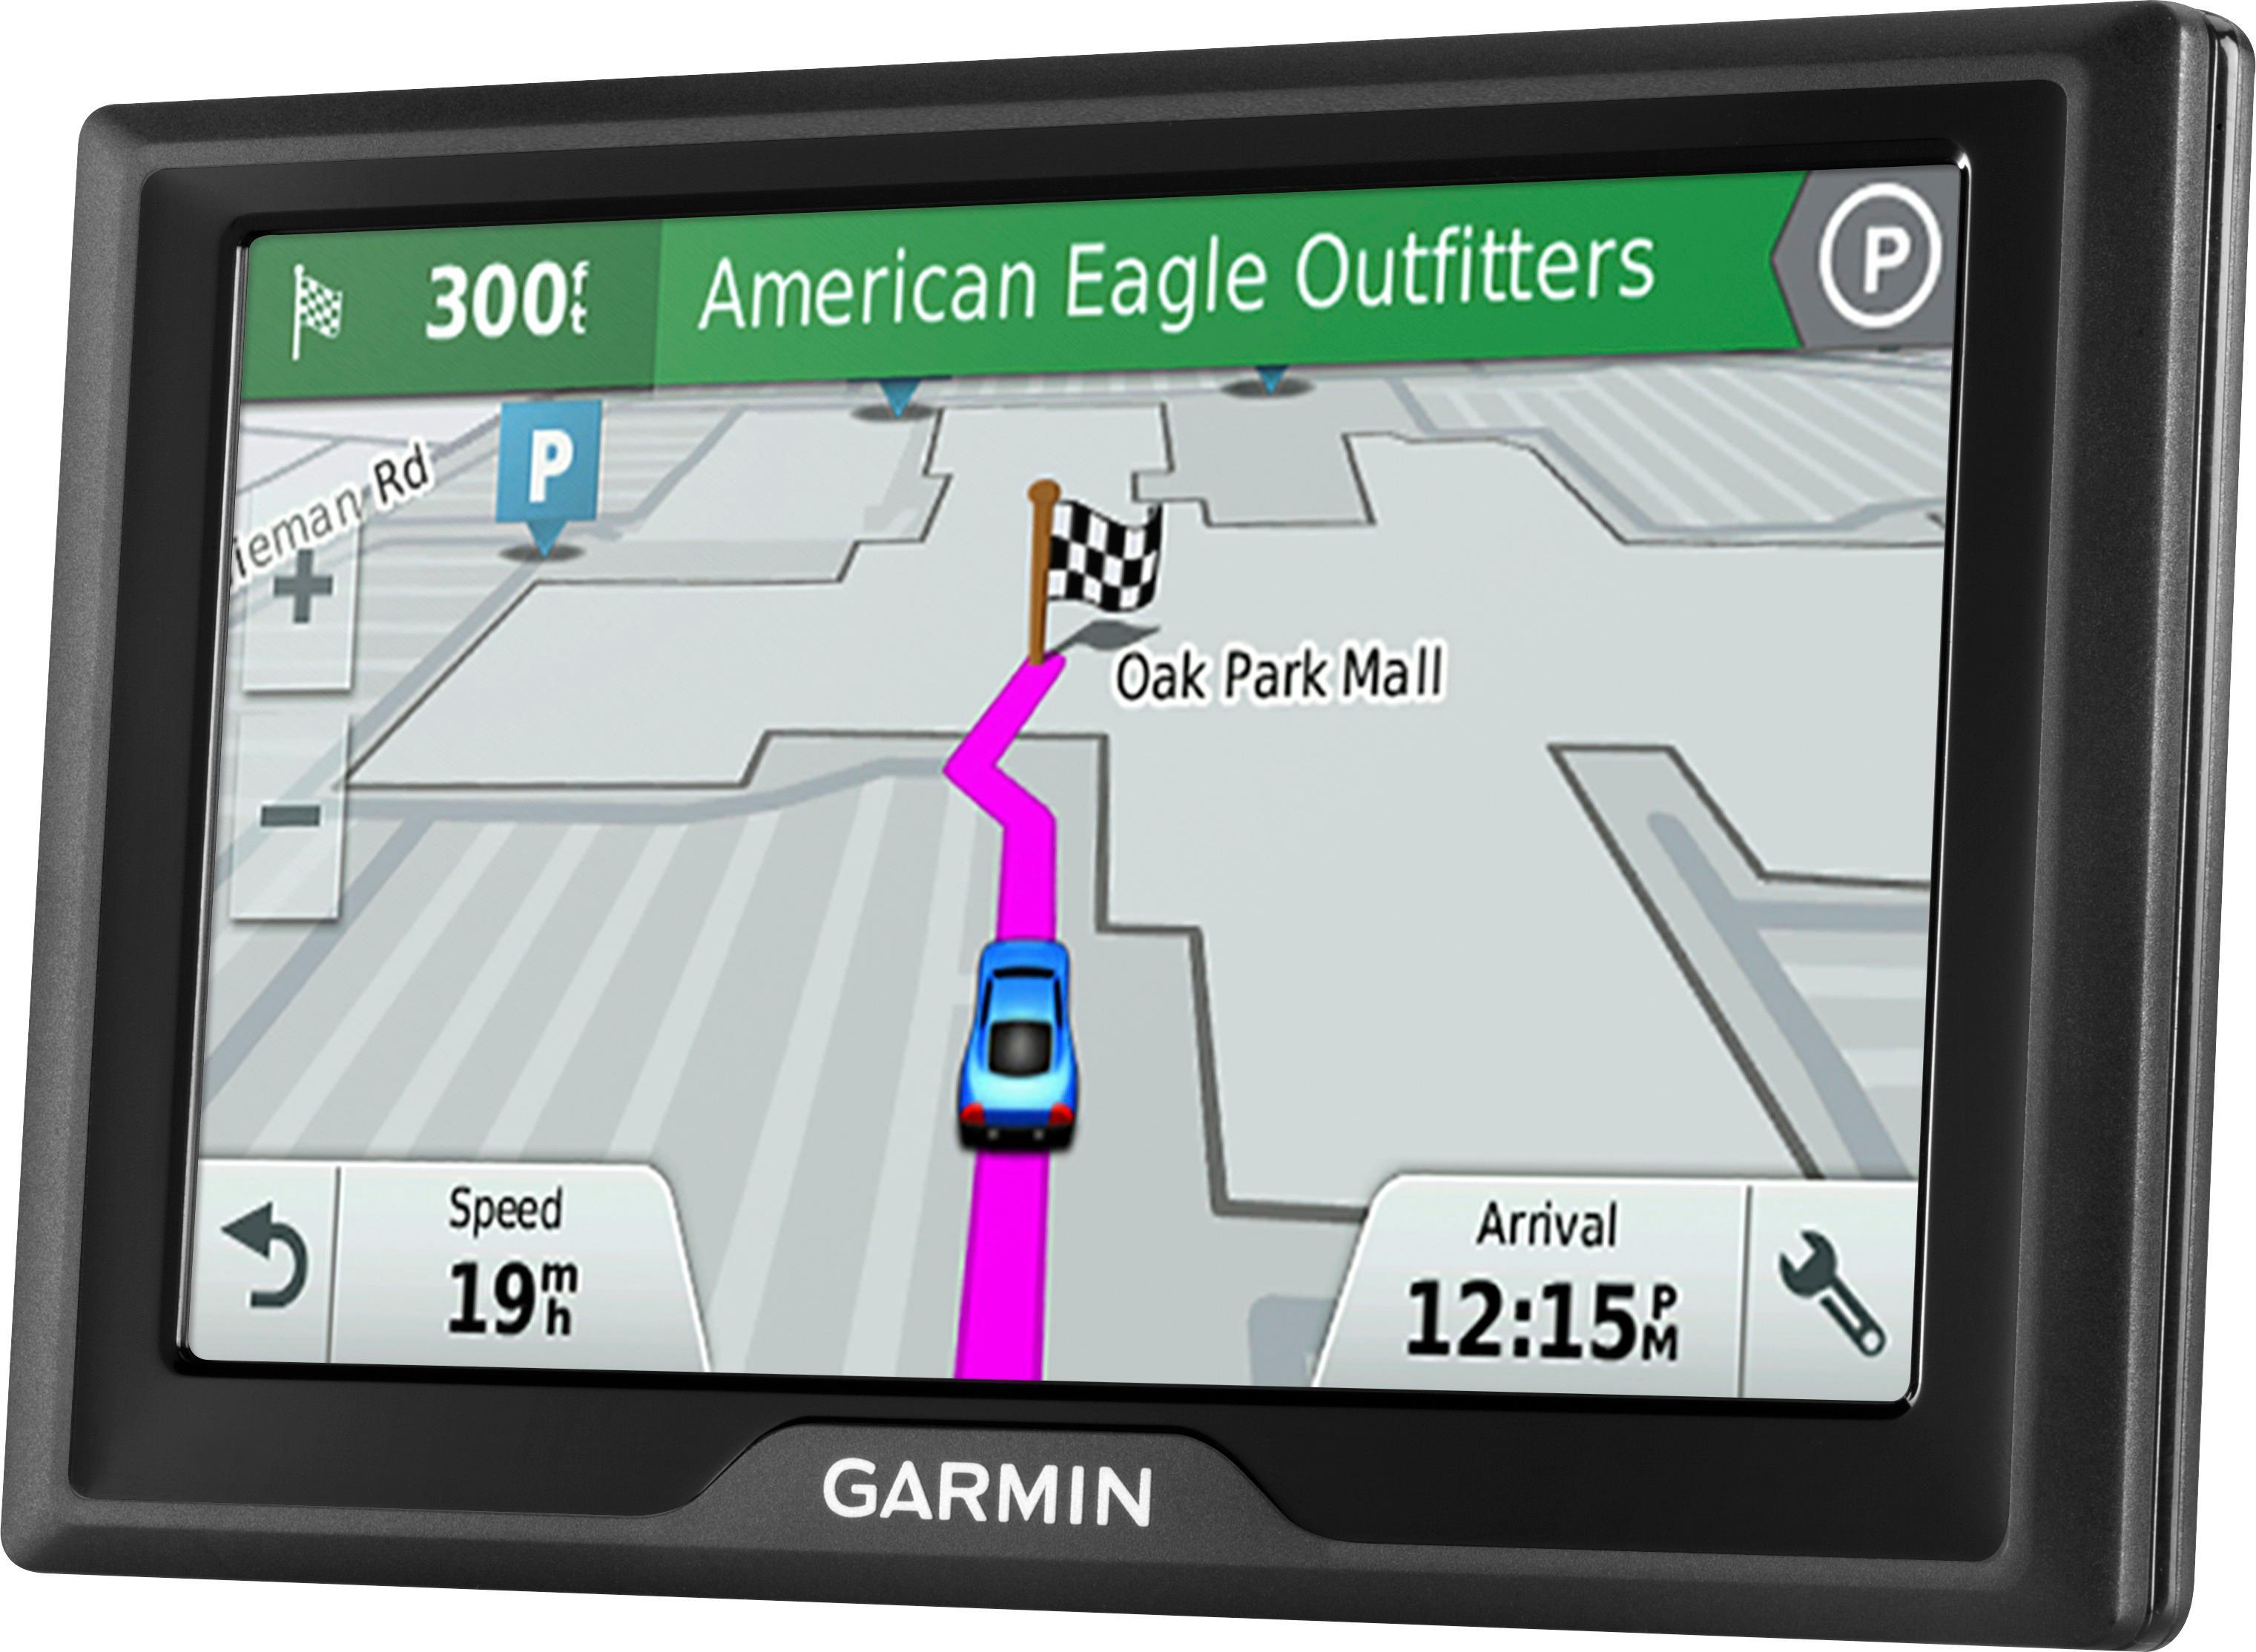 Garmin Drive LM GPS With Lifetime Map Updates Black - Best garmin lm models us maps